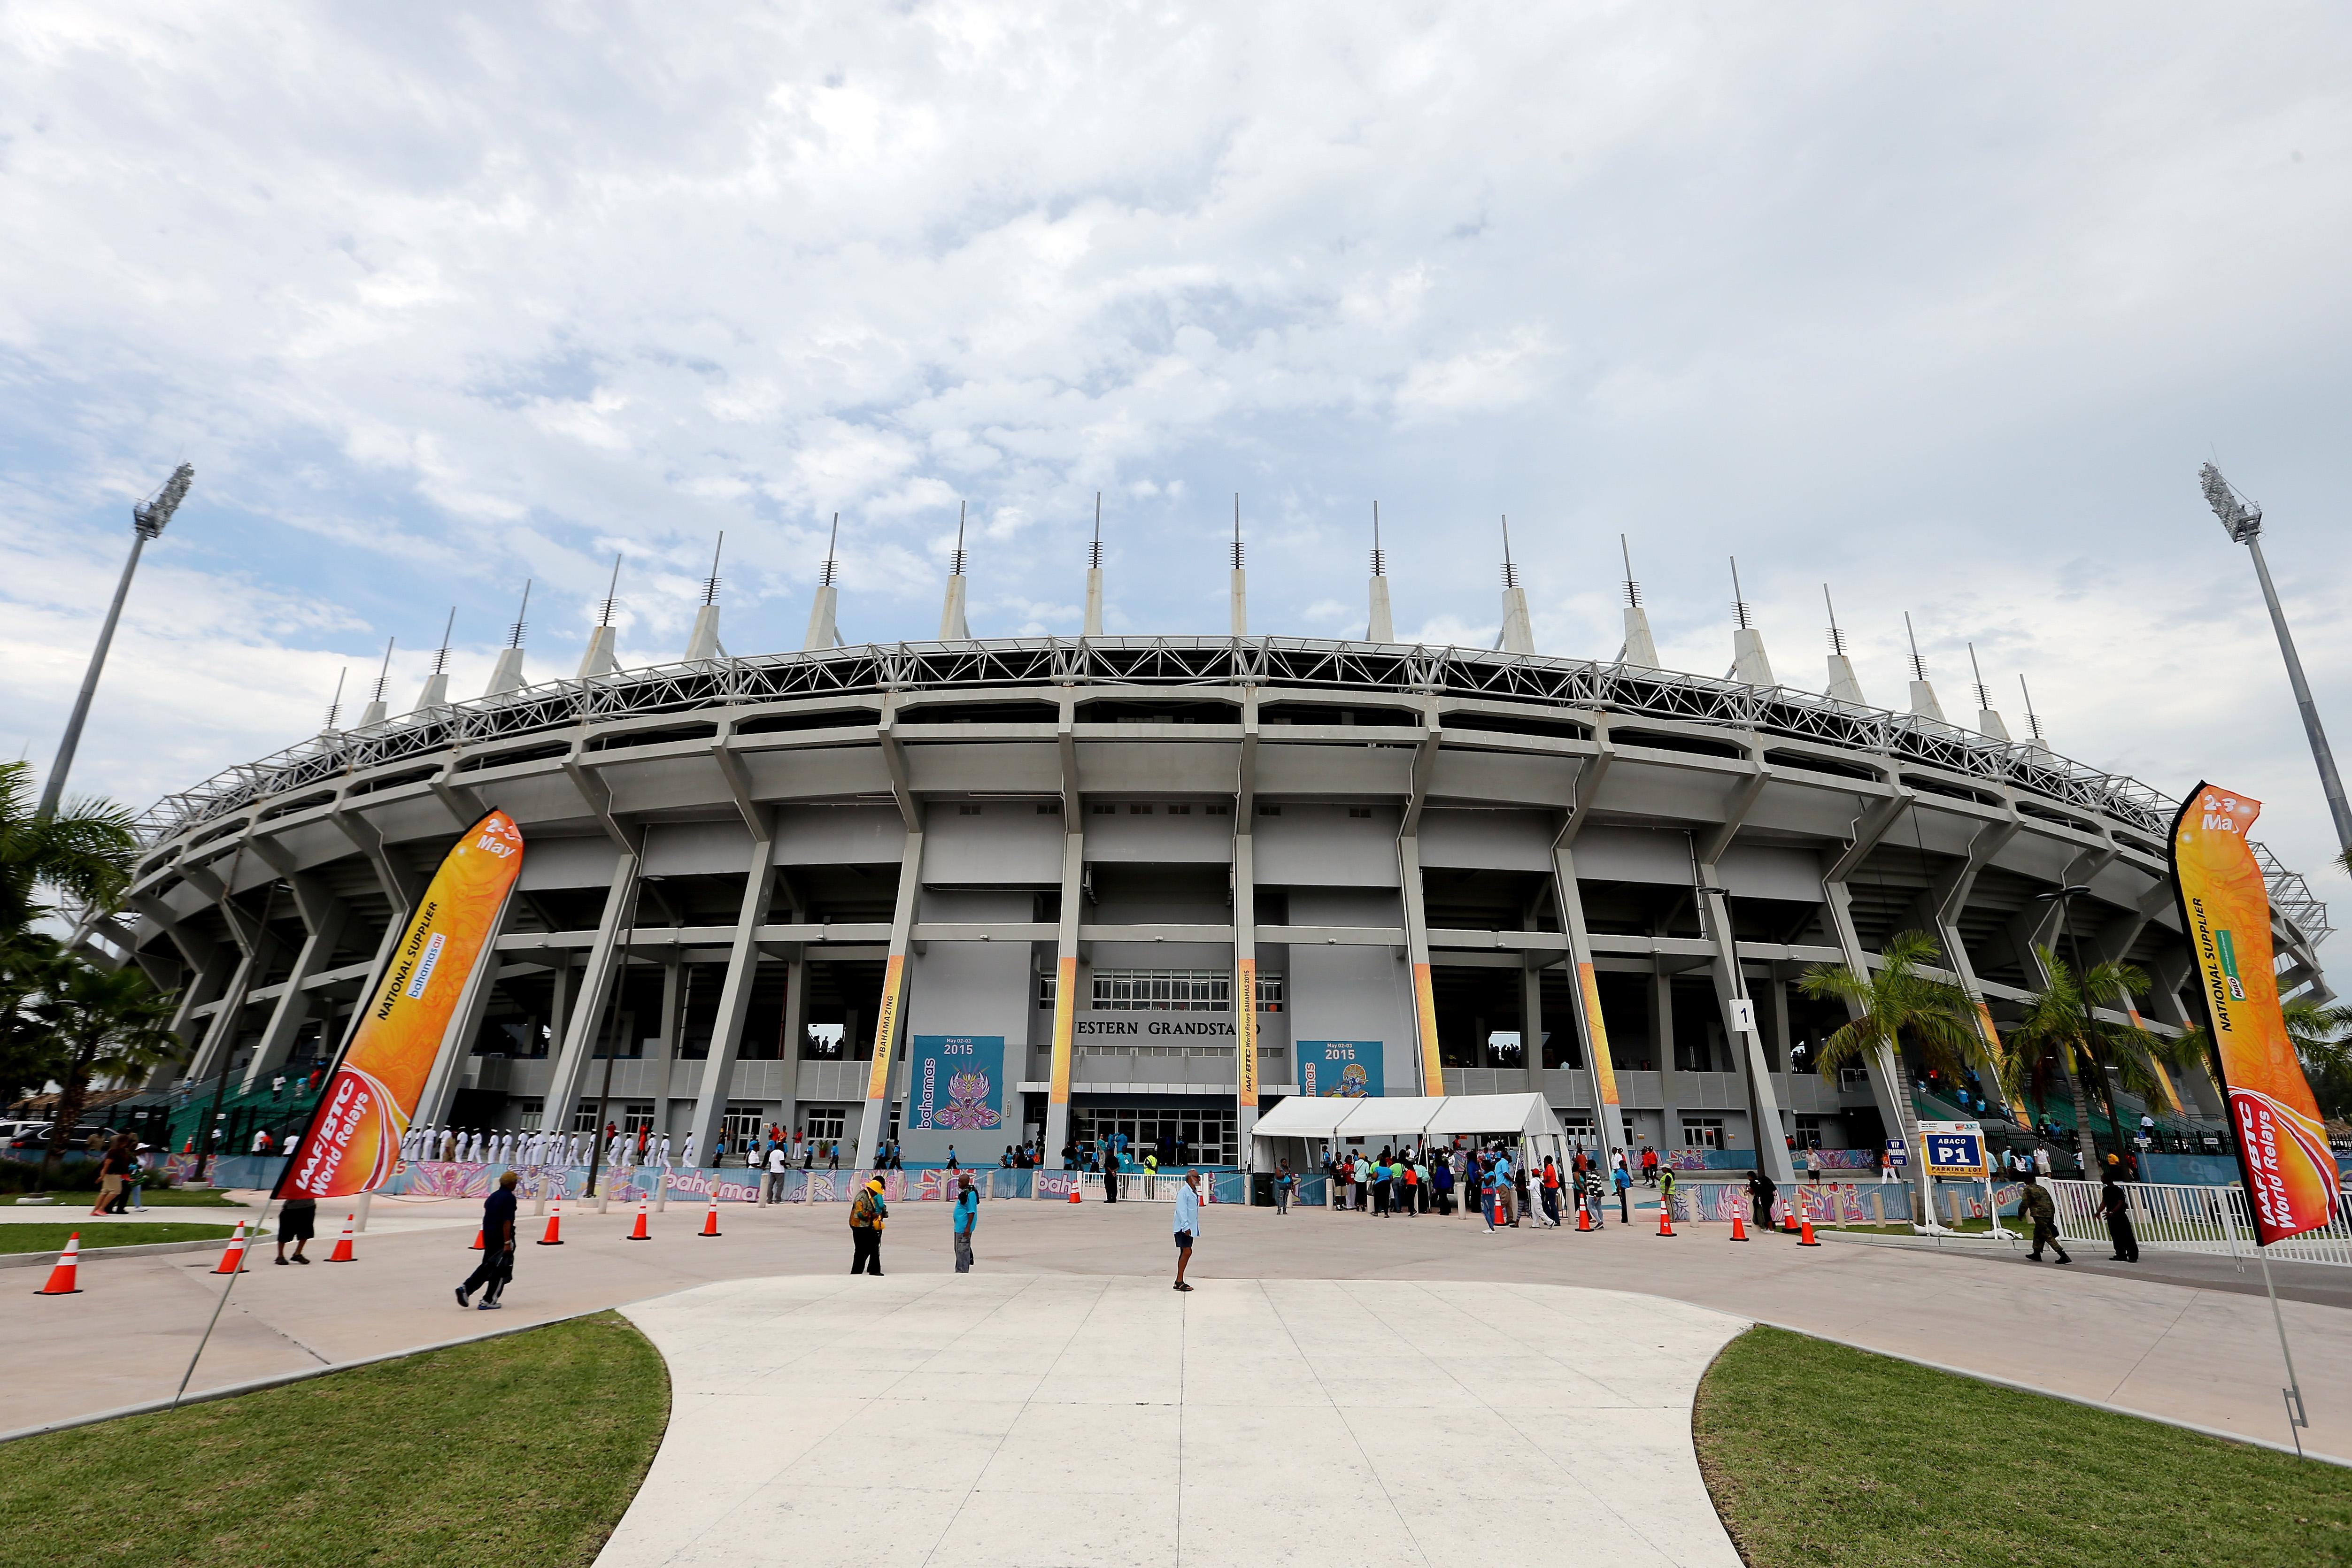 IAAF World Relays - Day 1